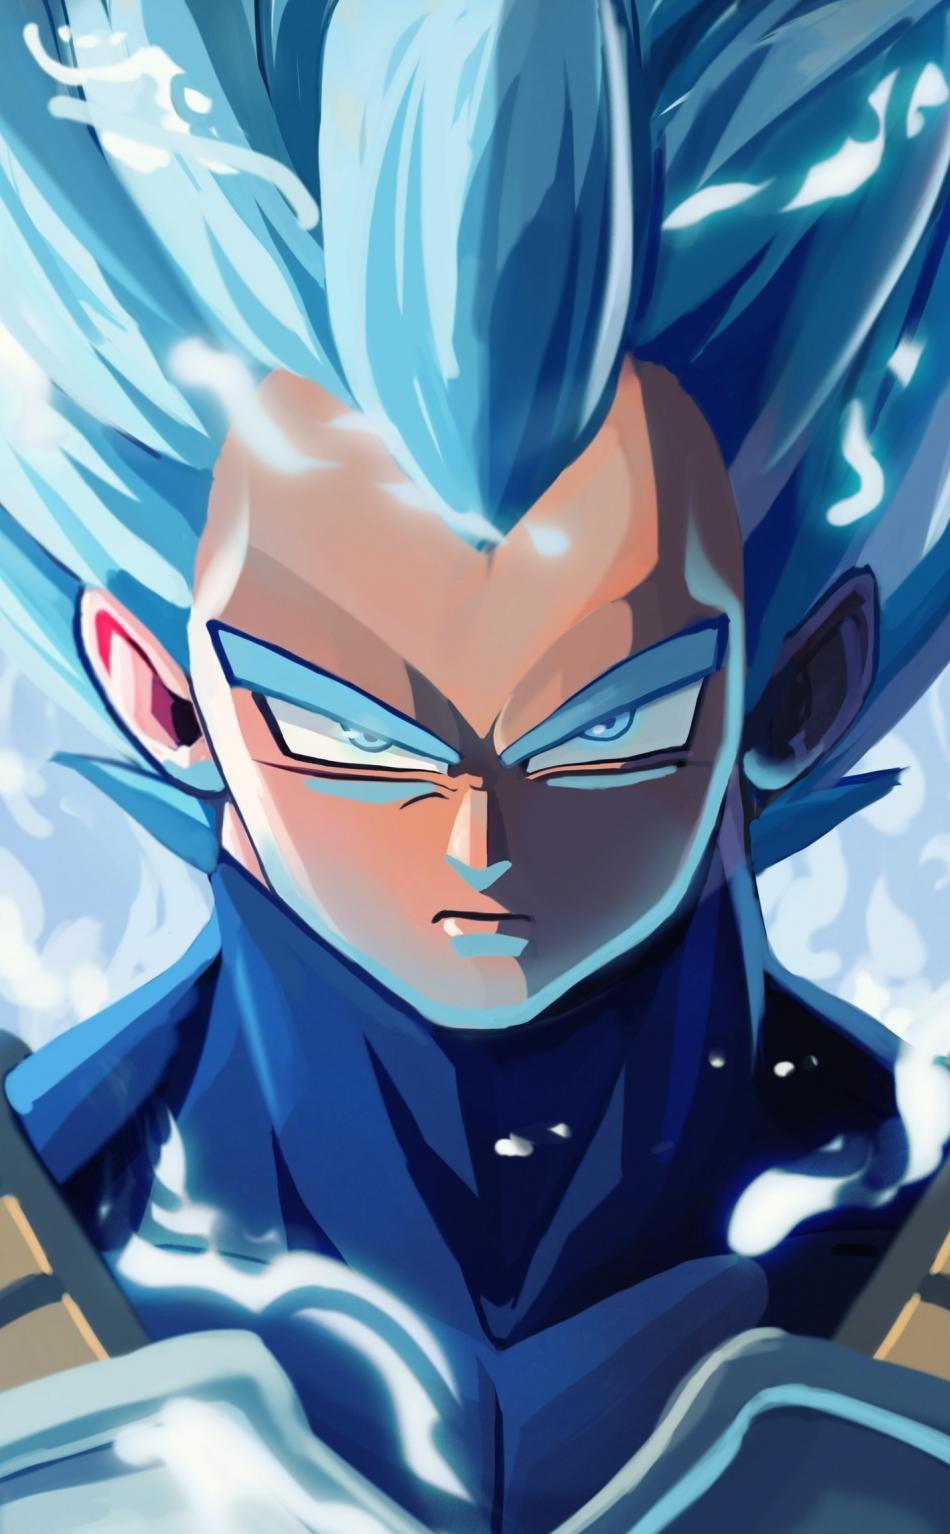 Hintergrundbild Vegeta Dragon Ball